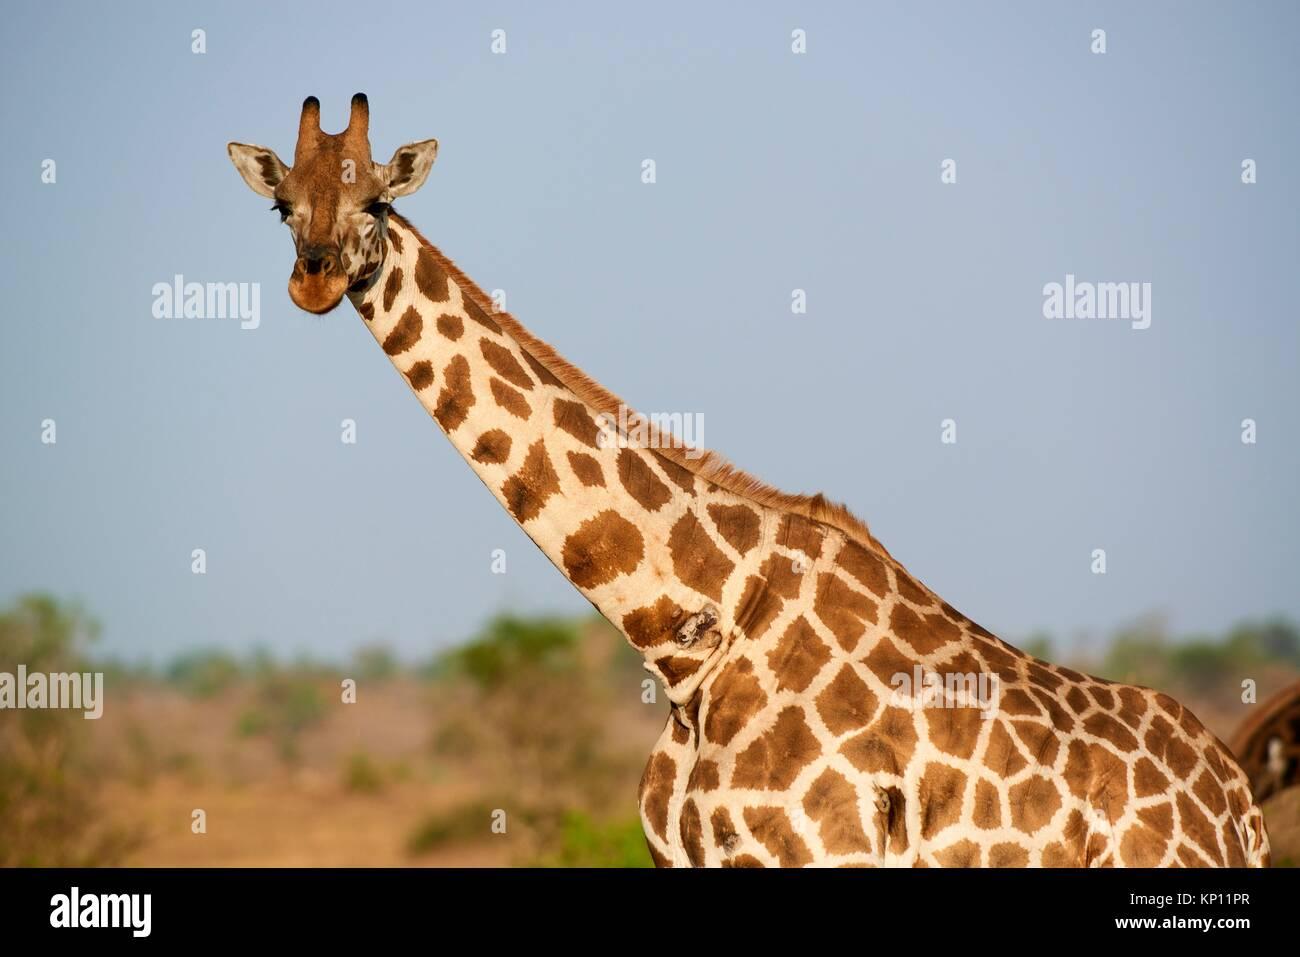 Rothschild's giraffe (Giraffa camelopardalis rothschildi) portrait in Murchisson Falls National Park, Uganda. - Stock Image